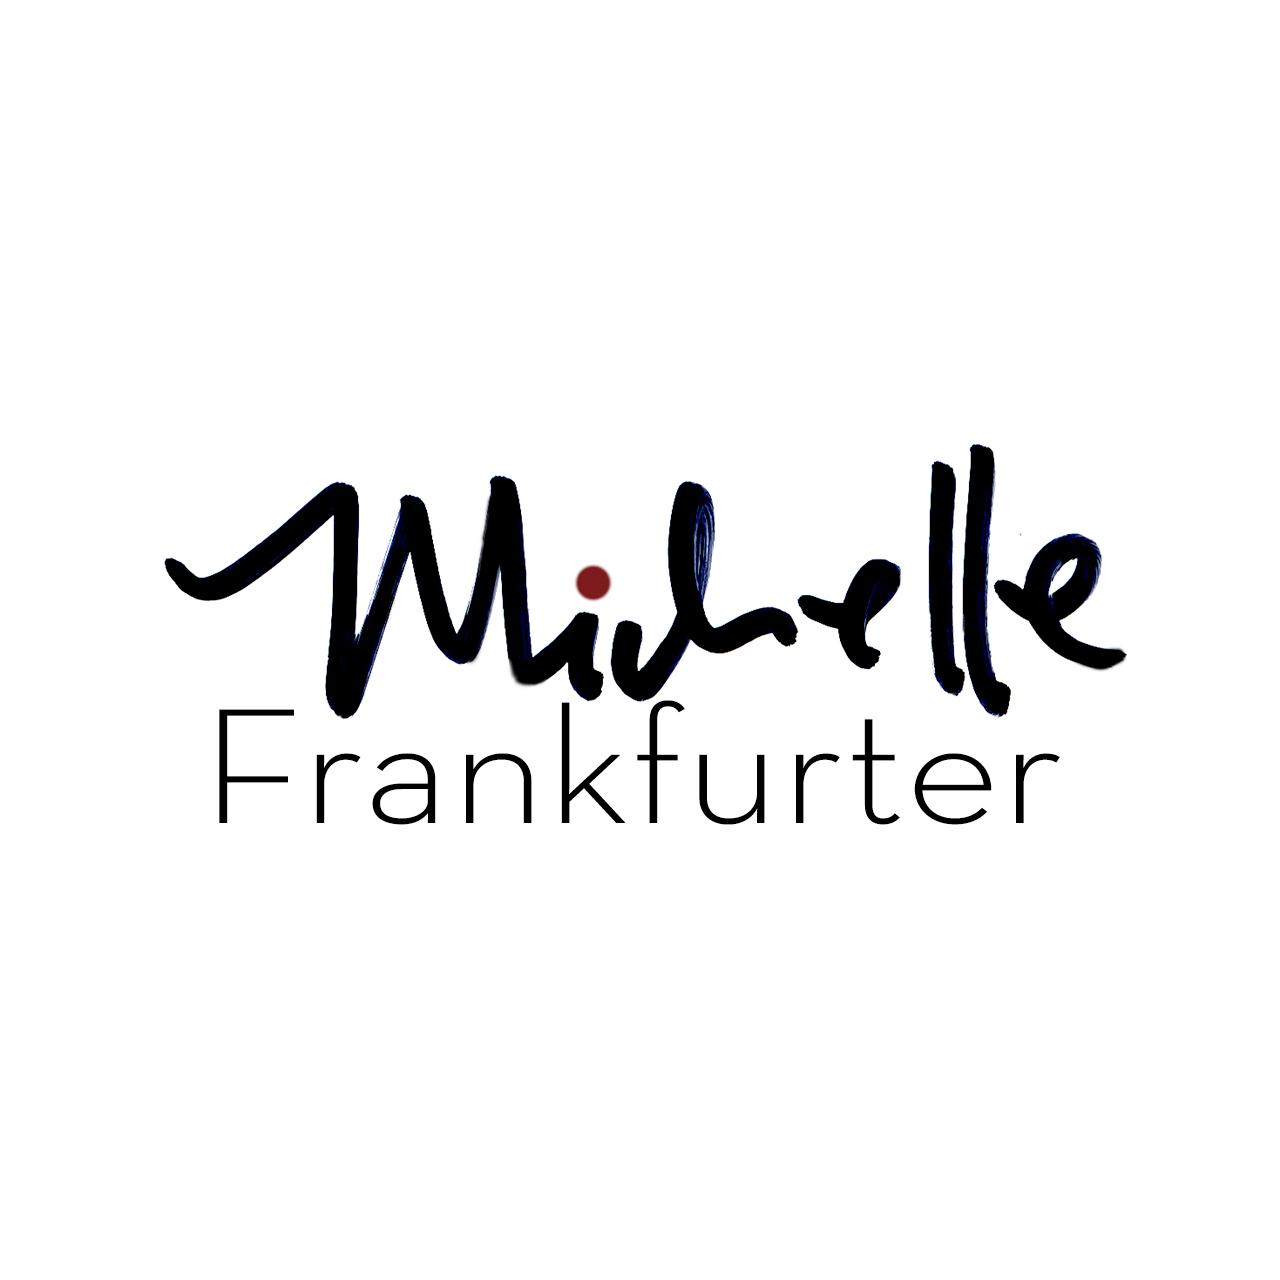 Michelle Frankfurter